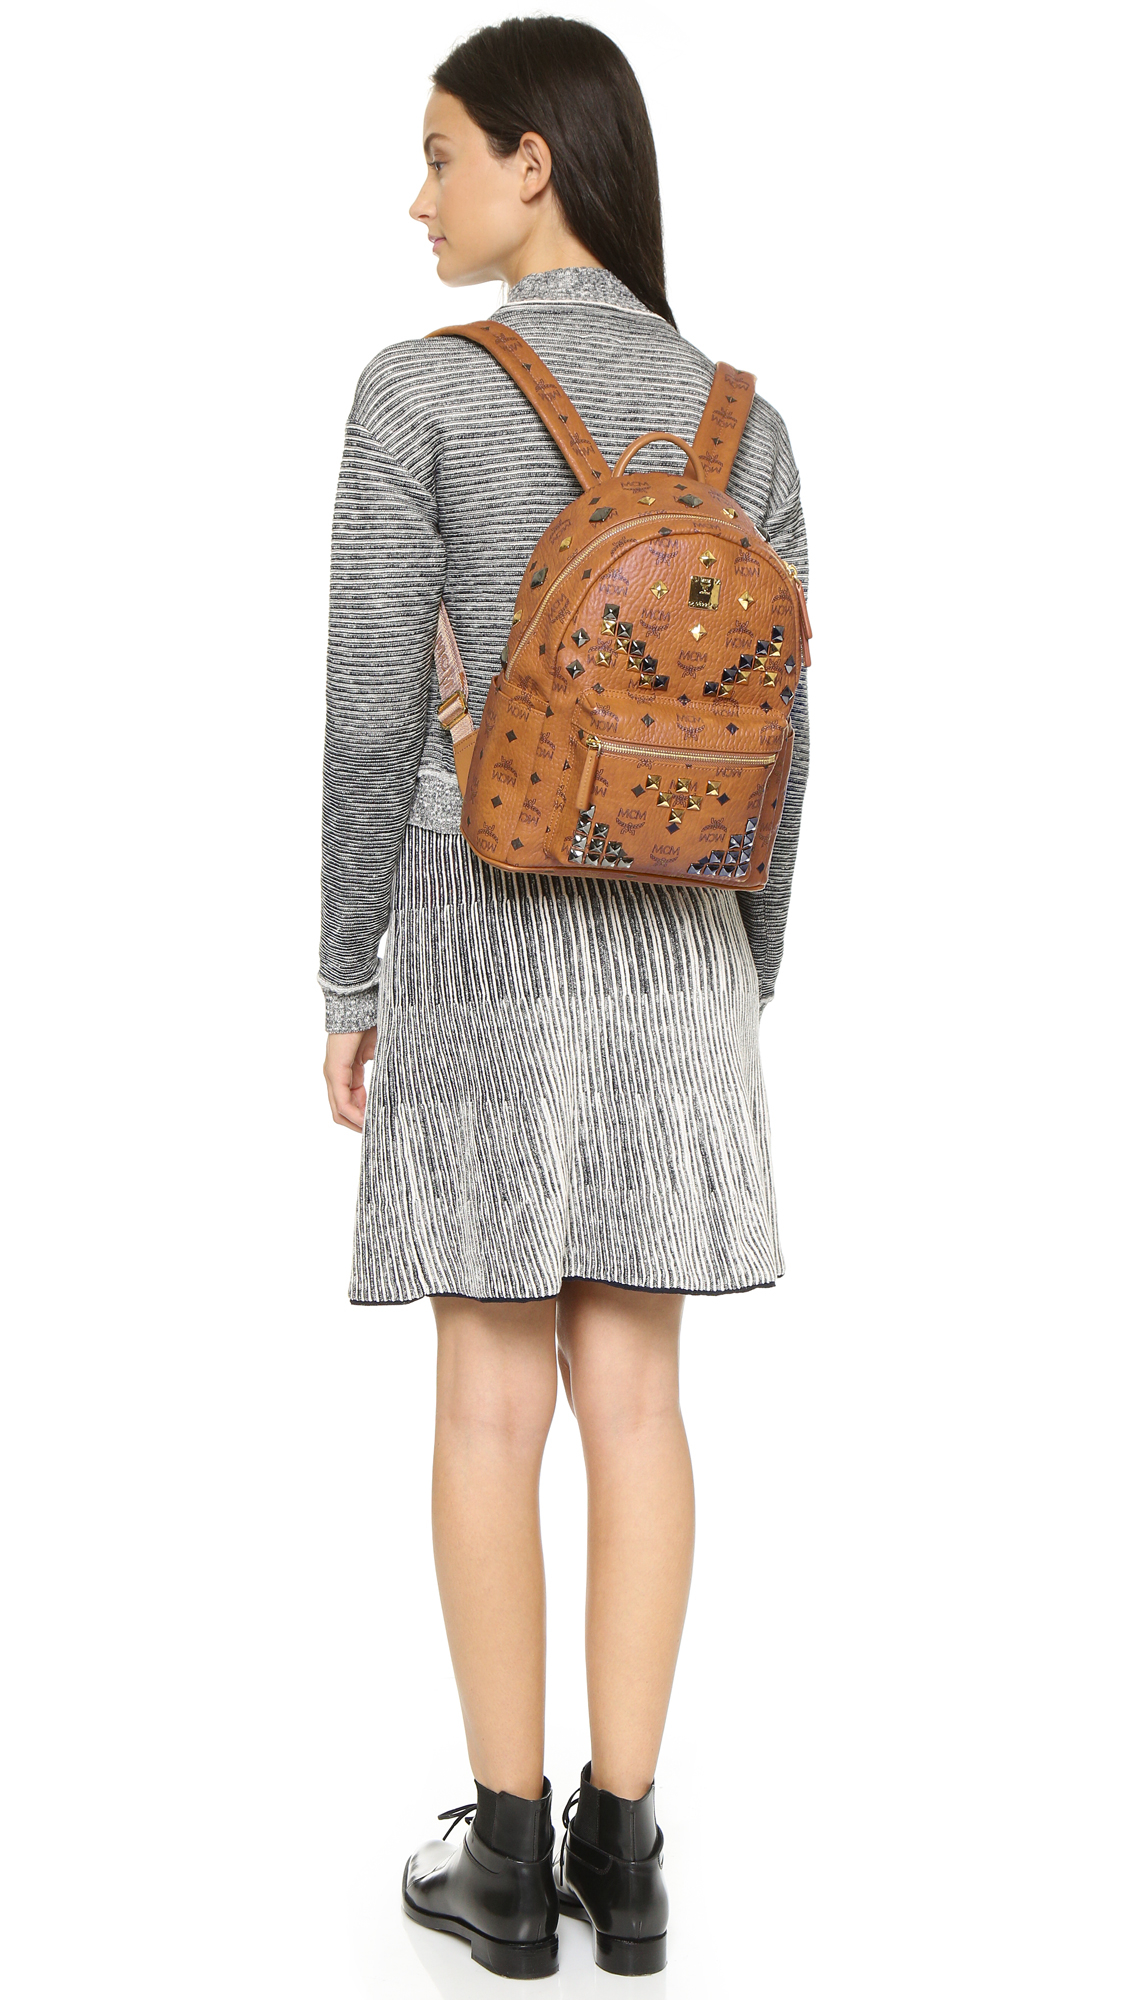 MCM Stark X-mini Side Stud Backpack in Brown - Lyst 31ecdce6fbf85